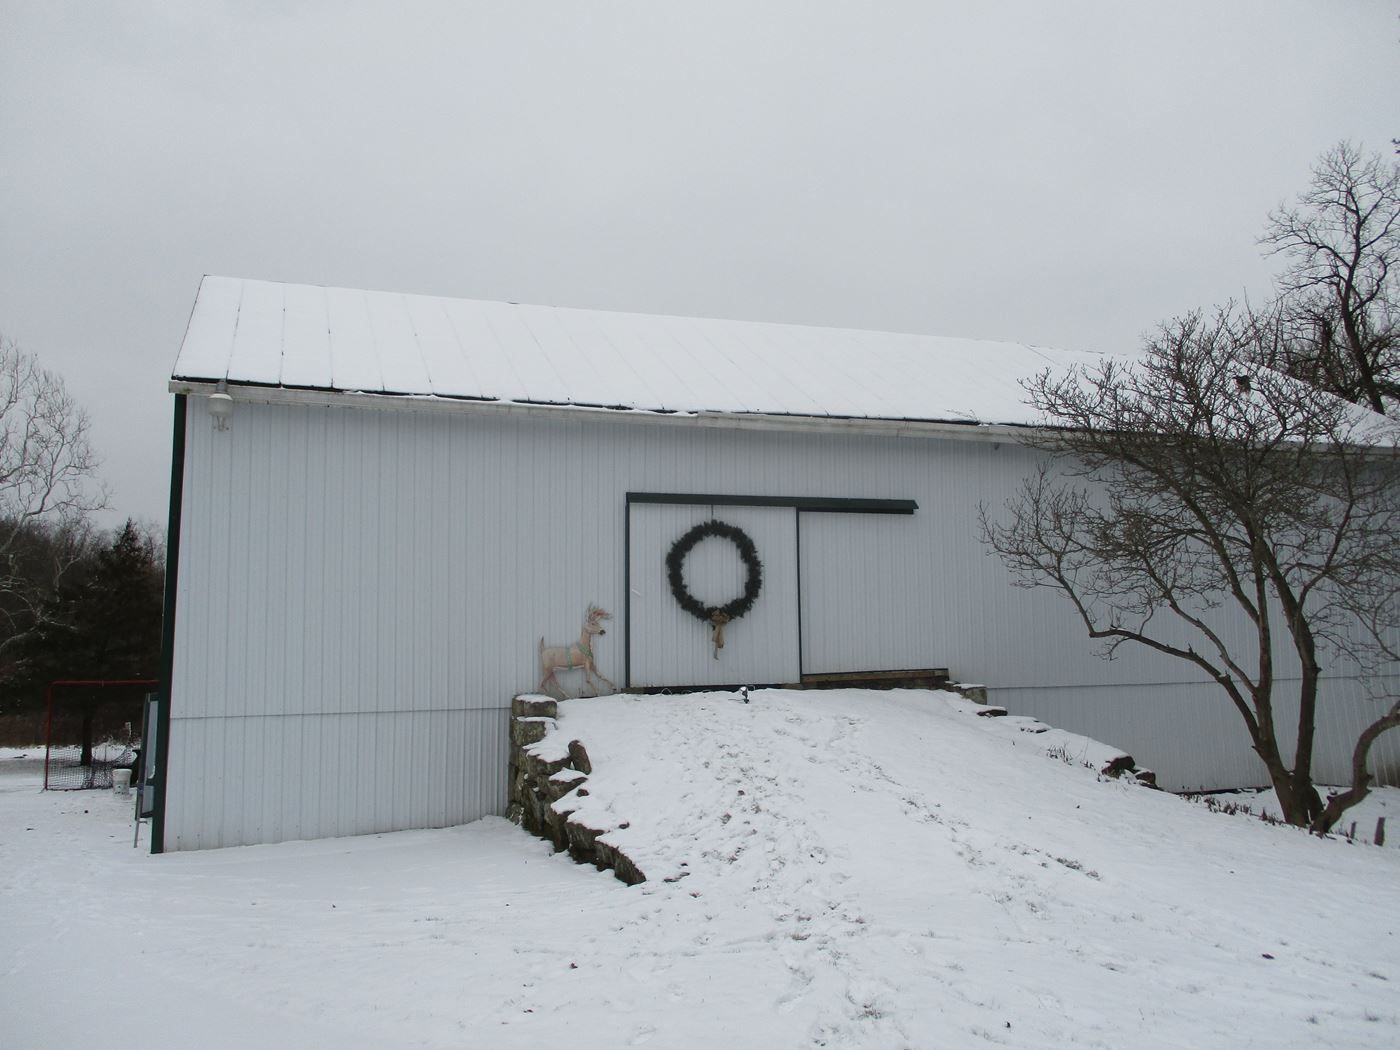 Hughes Barn Frame - Ohio Valley Barn Salvage - Barn Frames For Sale